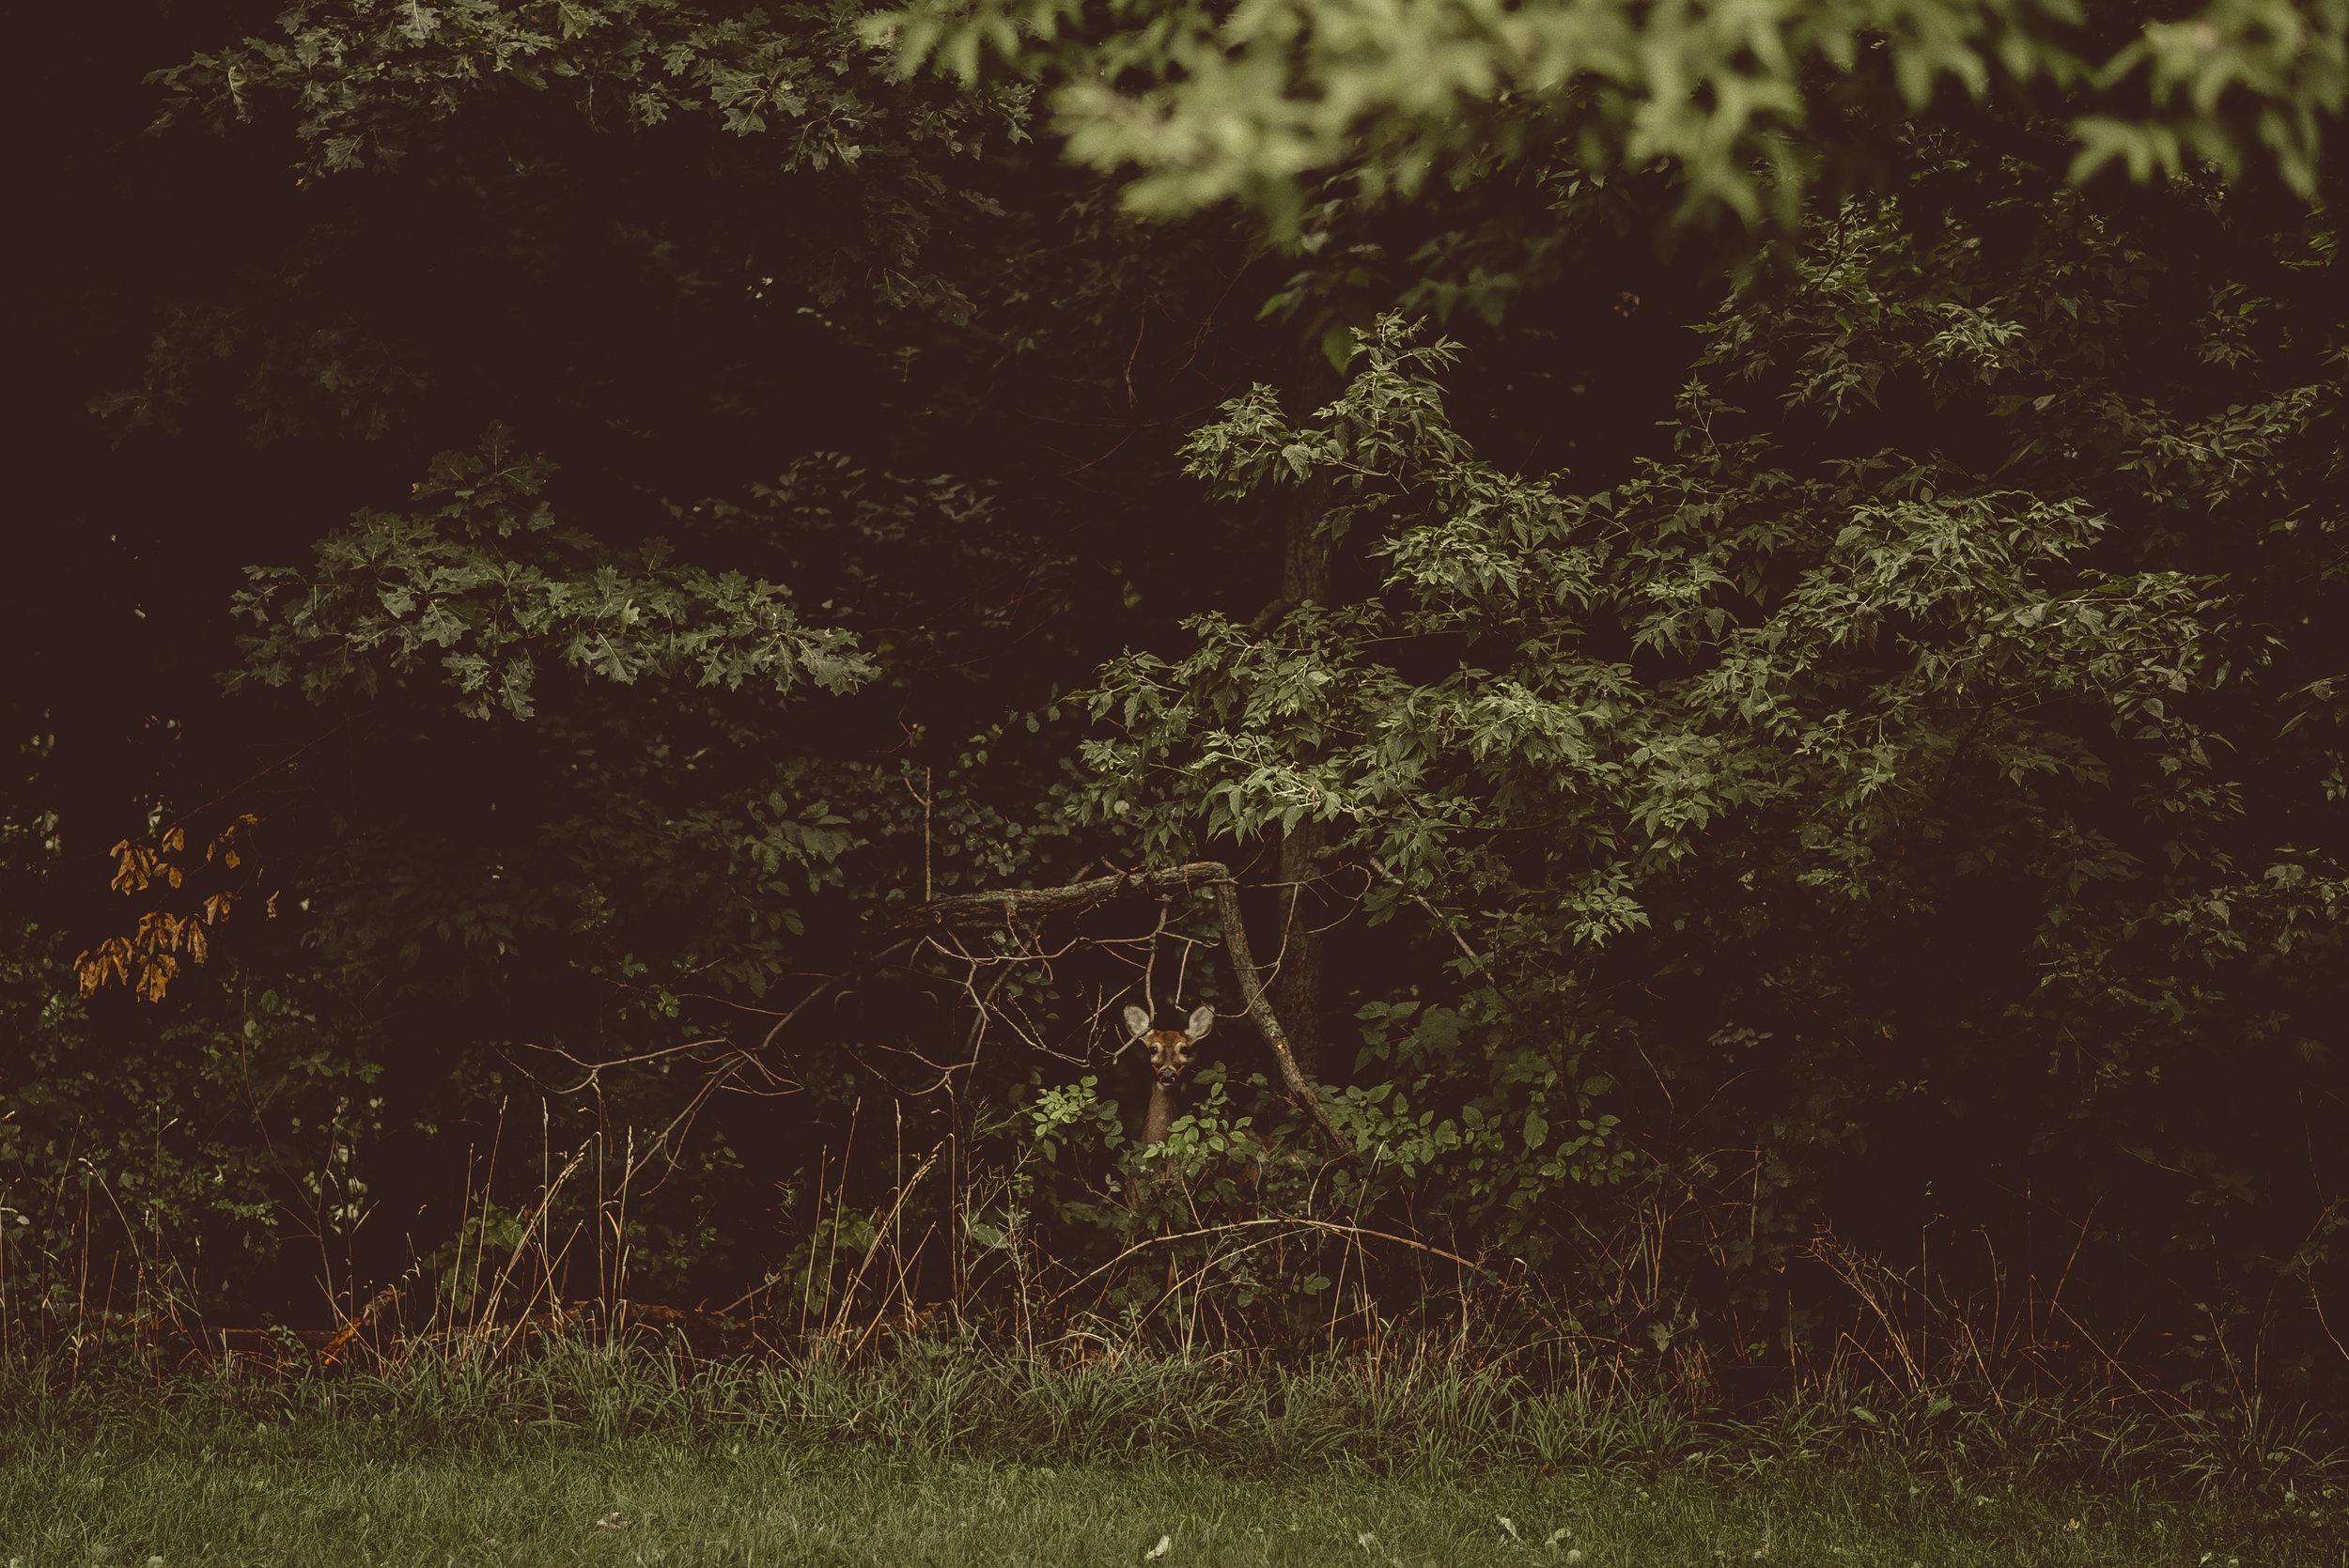 HeidiandDrewWedding-20160917-15-00-18.jpg